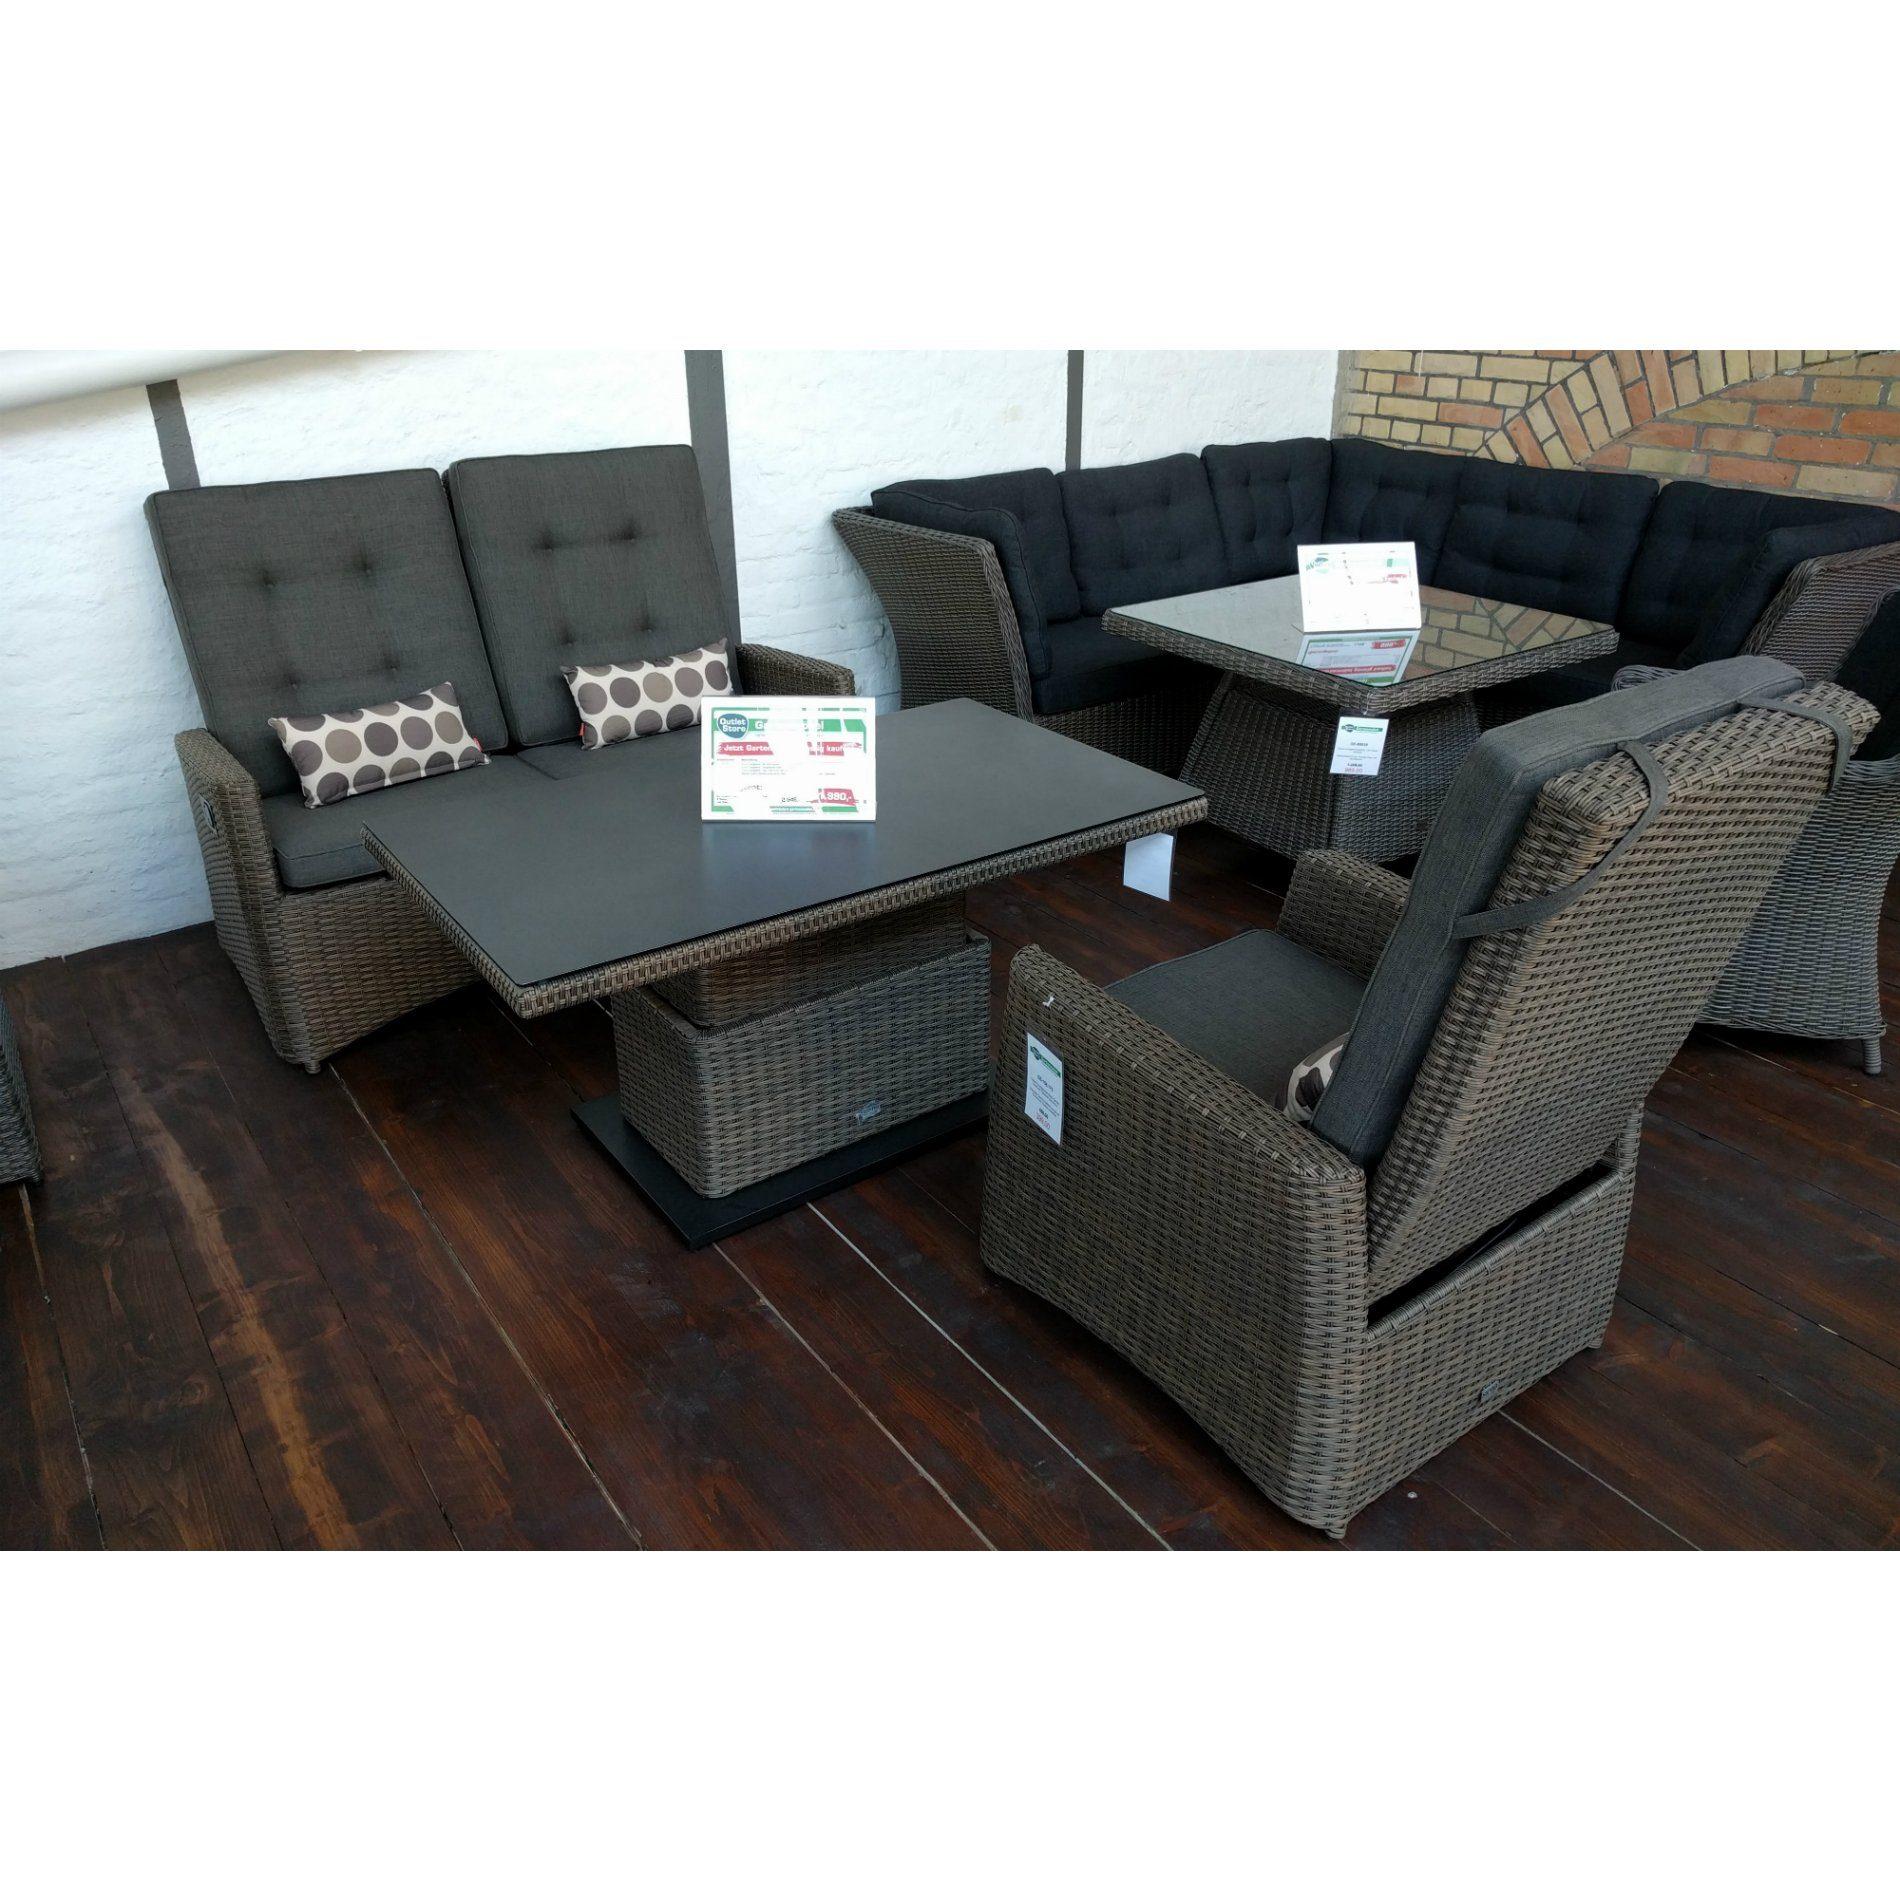 Siena Garden Loungeset Teramo - perfekter Sitzkomfort!